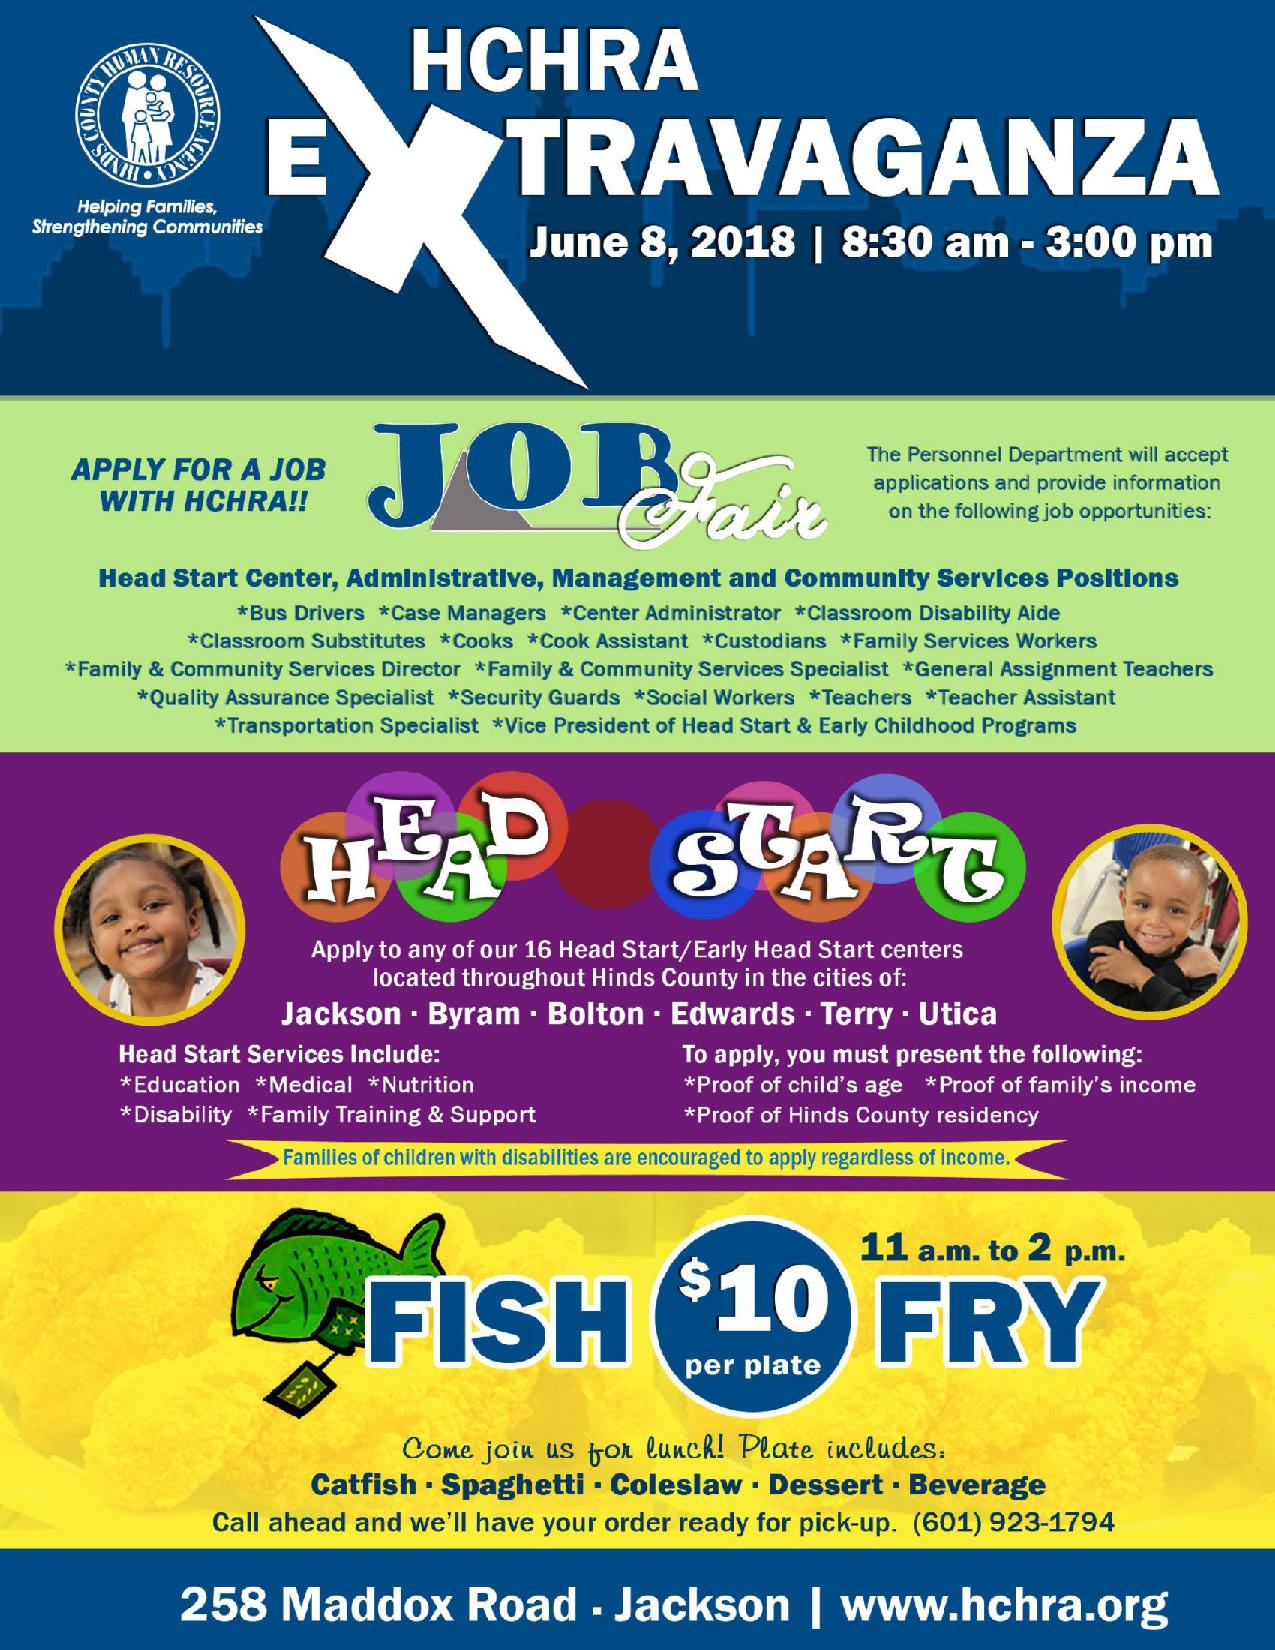 Head Start Recruitment And Job Fair Extravaganza Friday June 8th